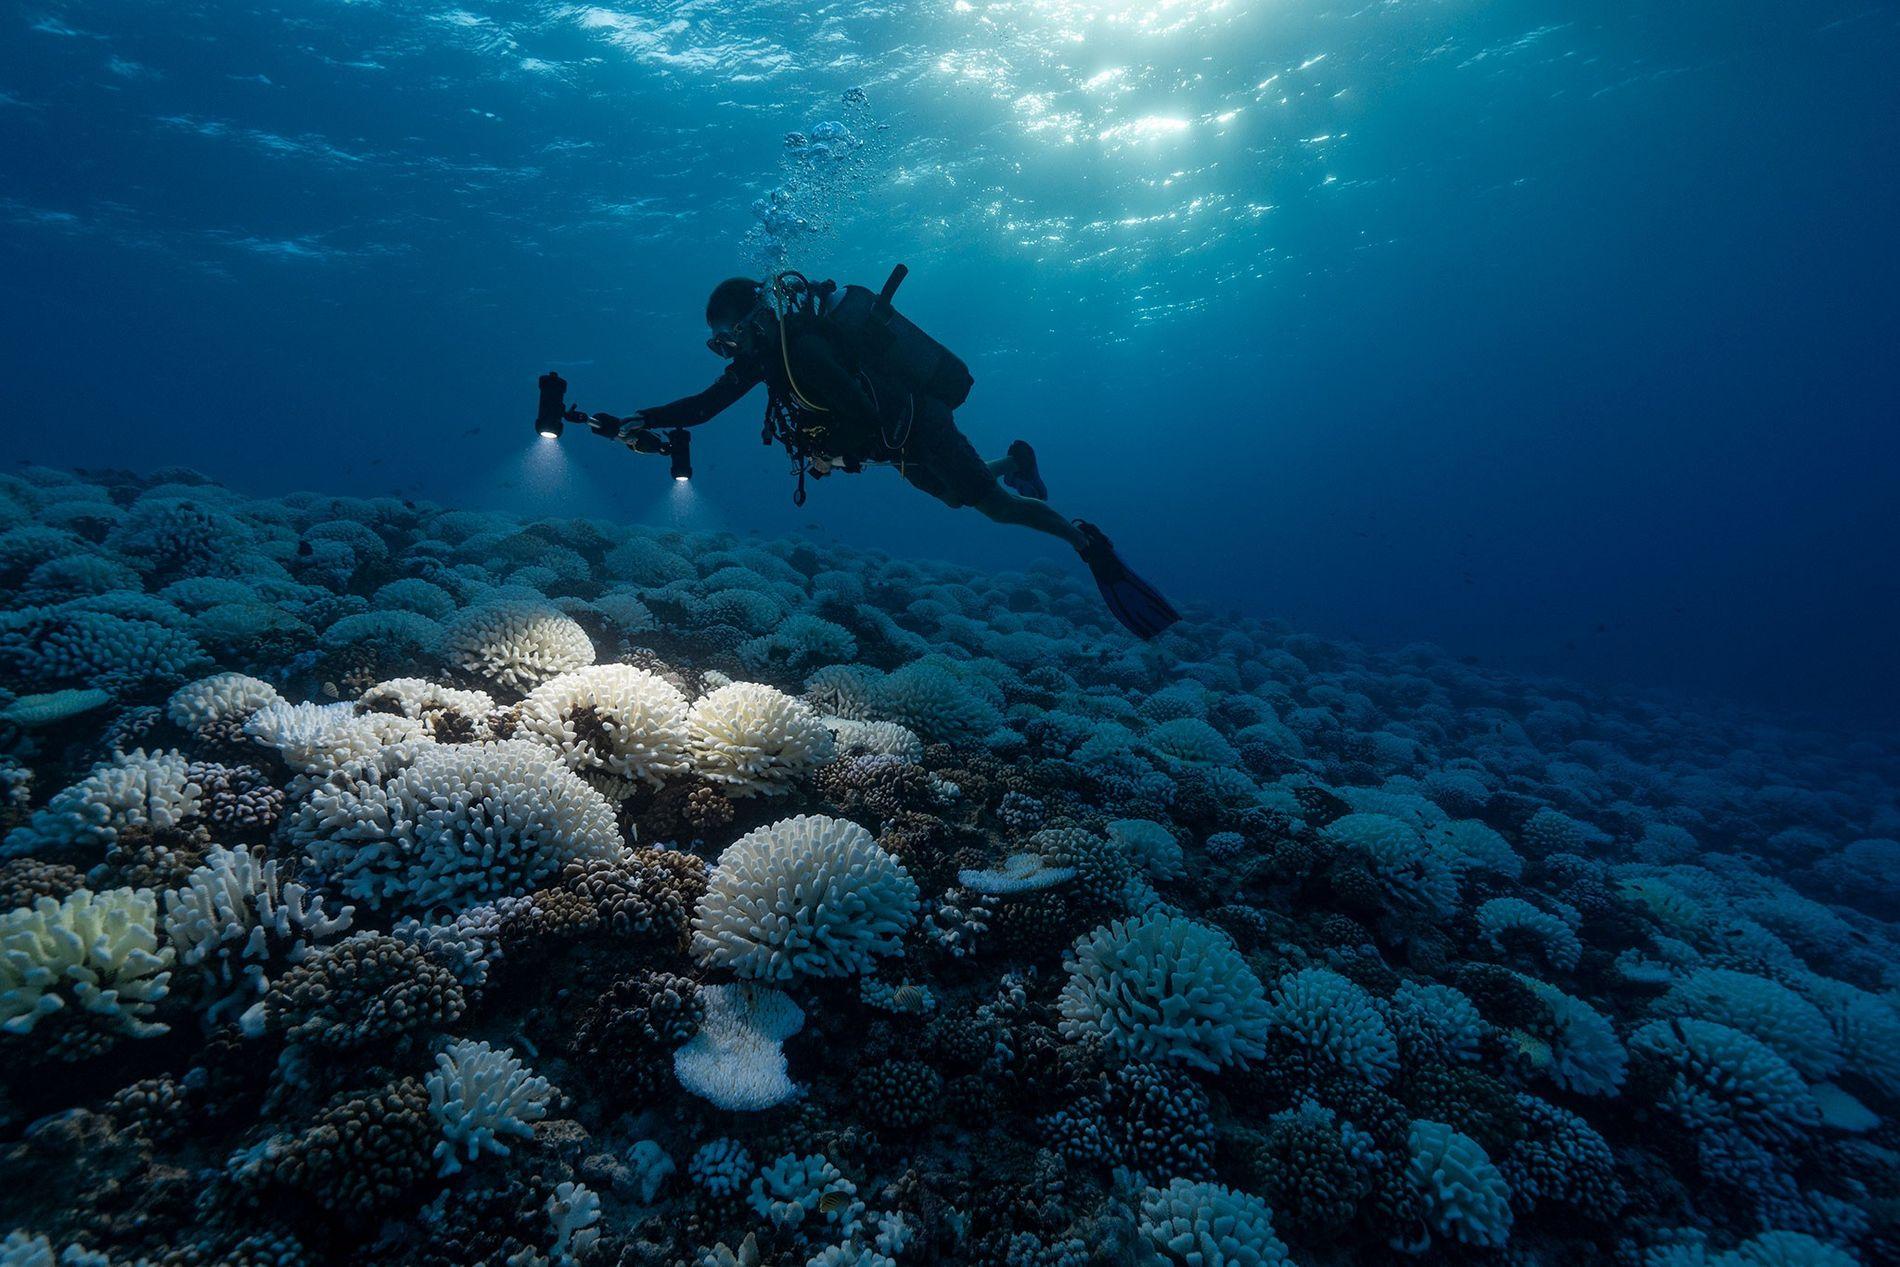 Arrecife de coral